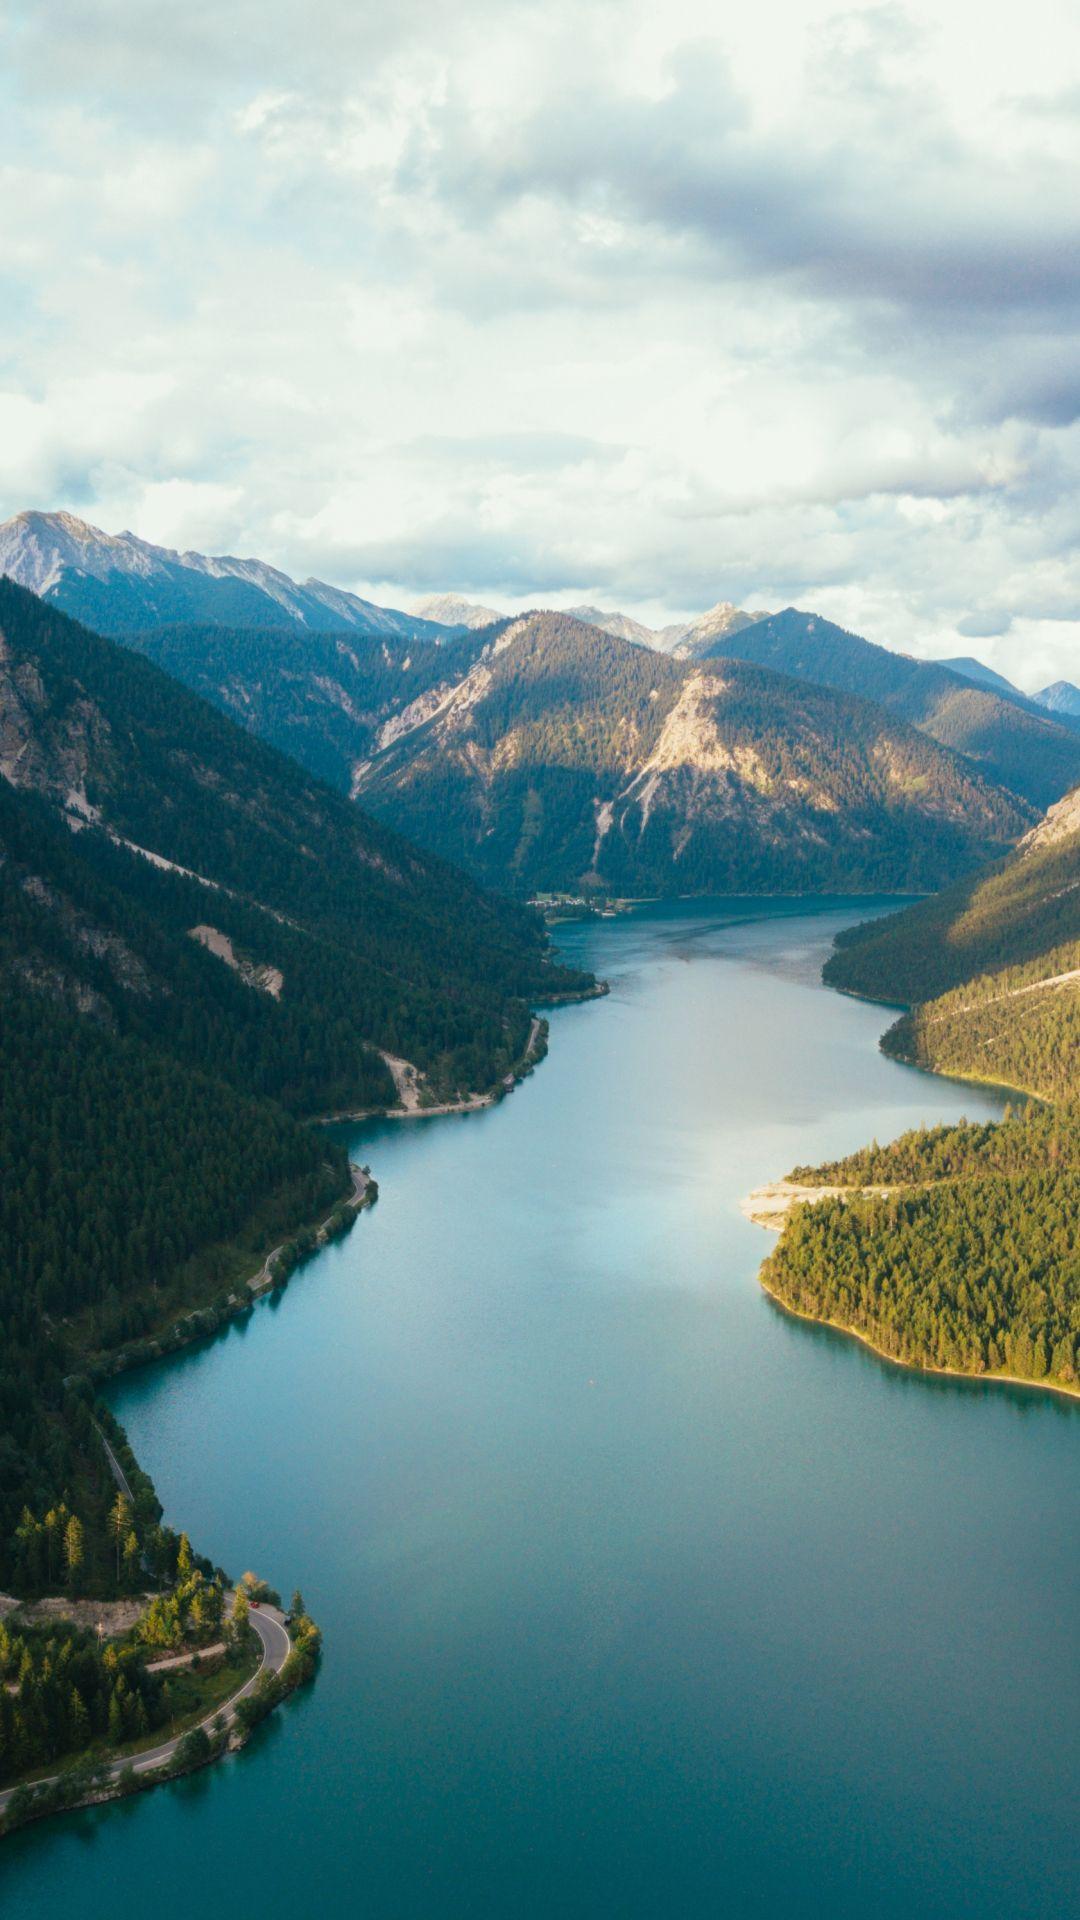 Austria Rivers And Lakes Photos